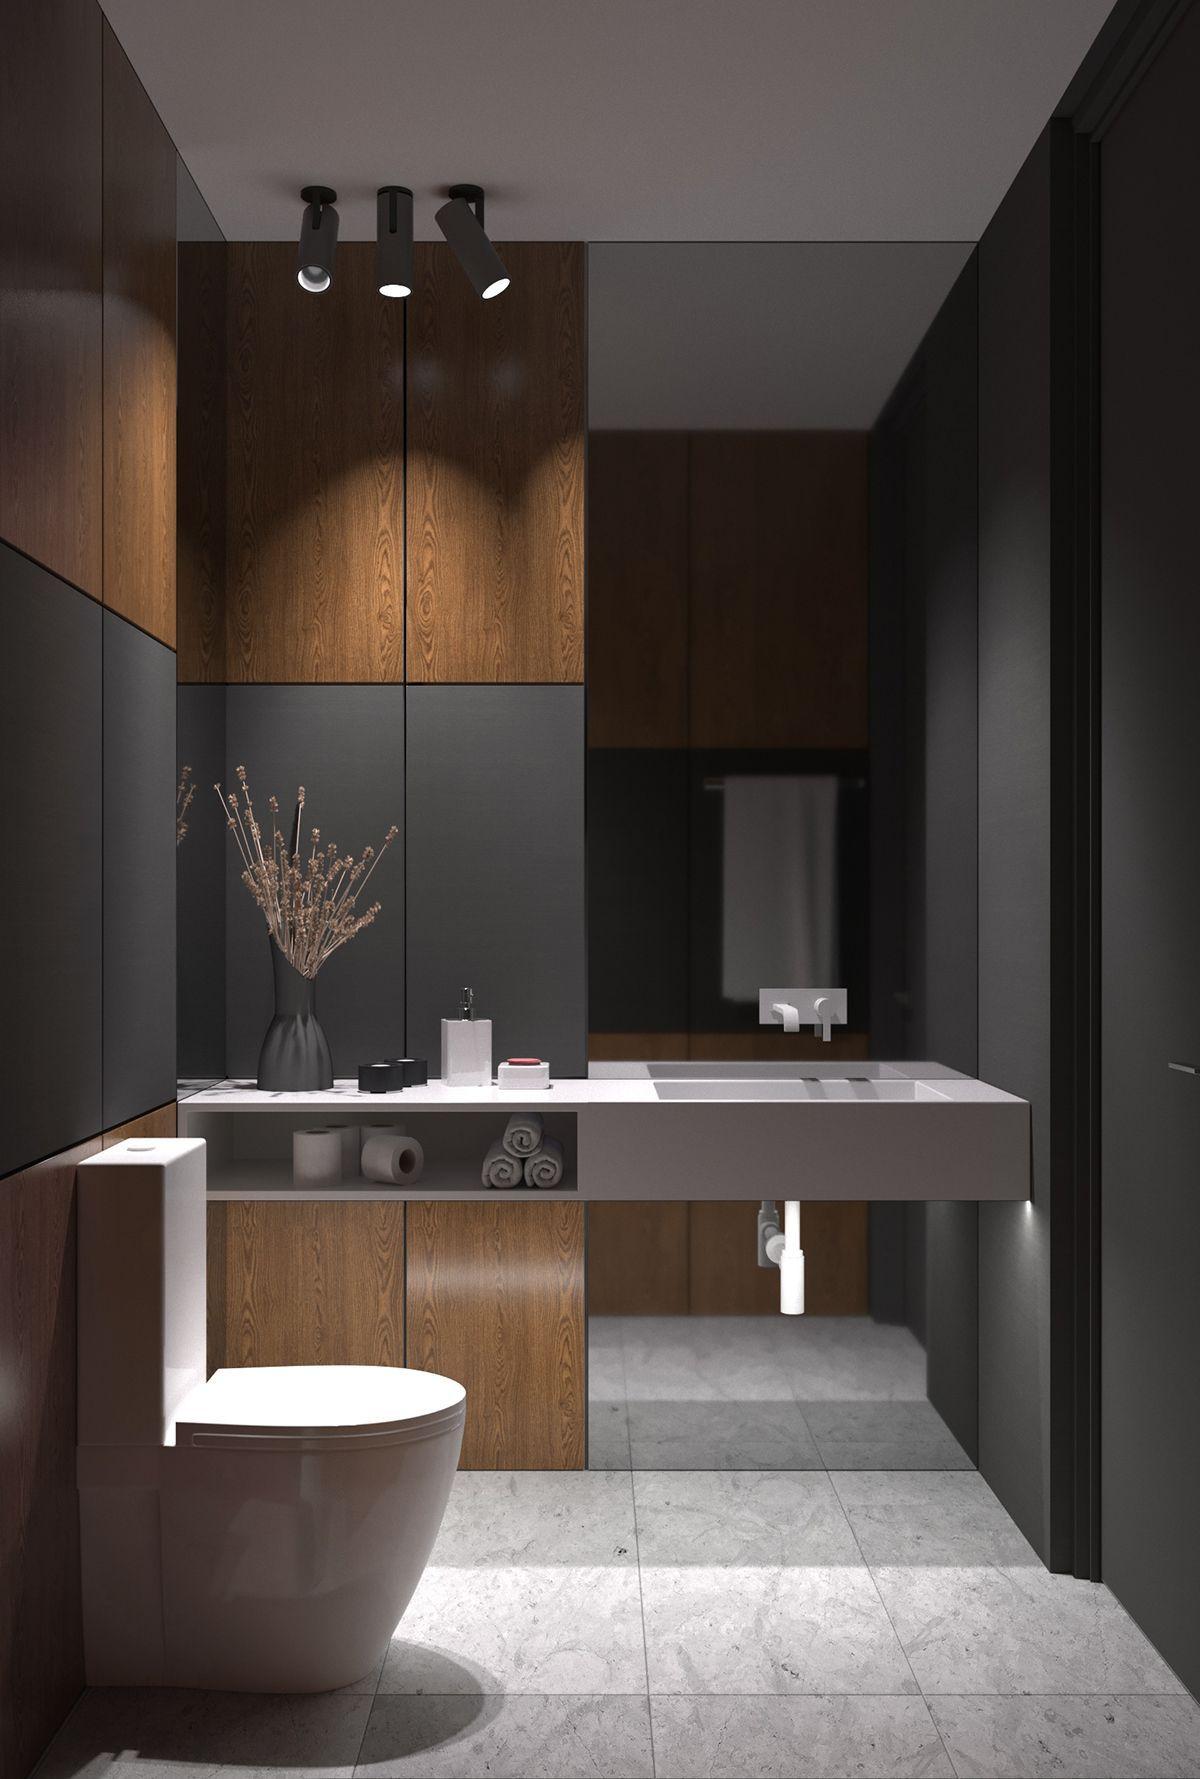 Badezimmerdesign 8 x 6 what have these lighting designs in common  interior  pinterest